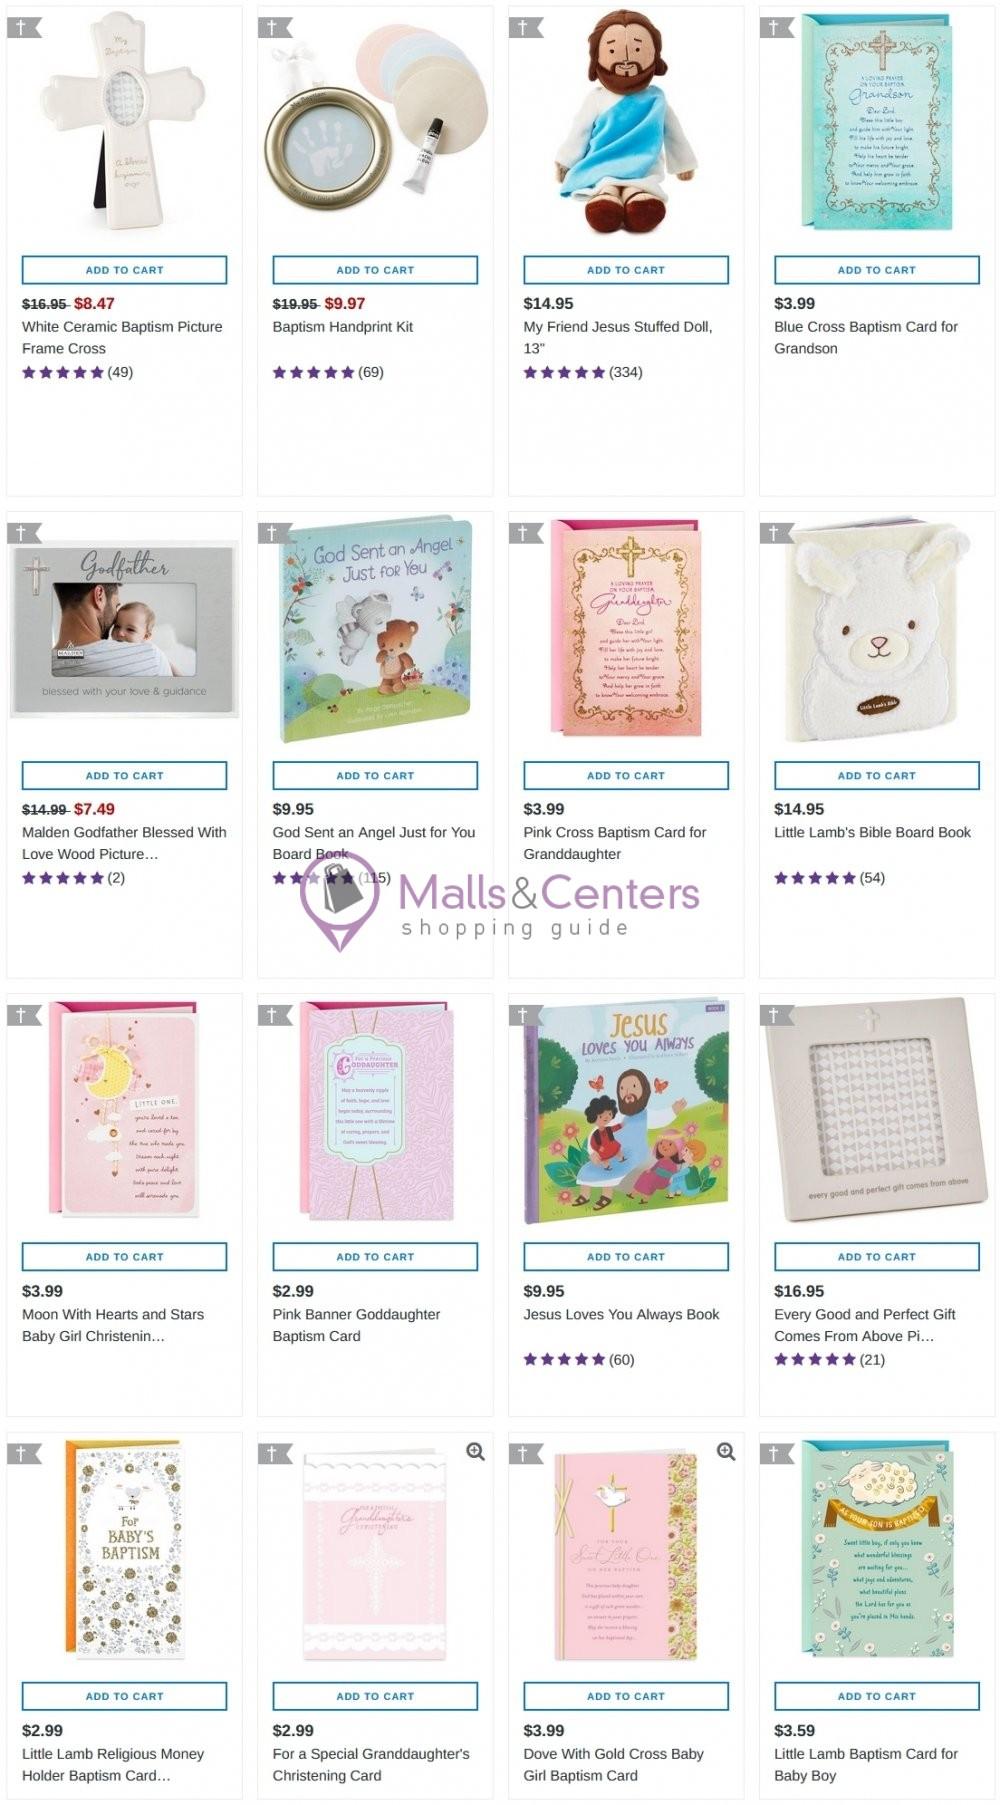 weekly ads Hallmark - page 1 - mallscenters.com